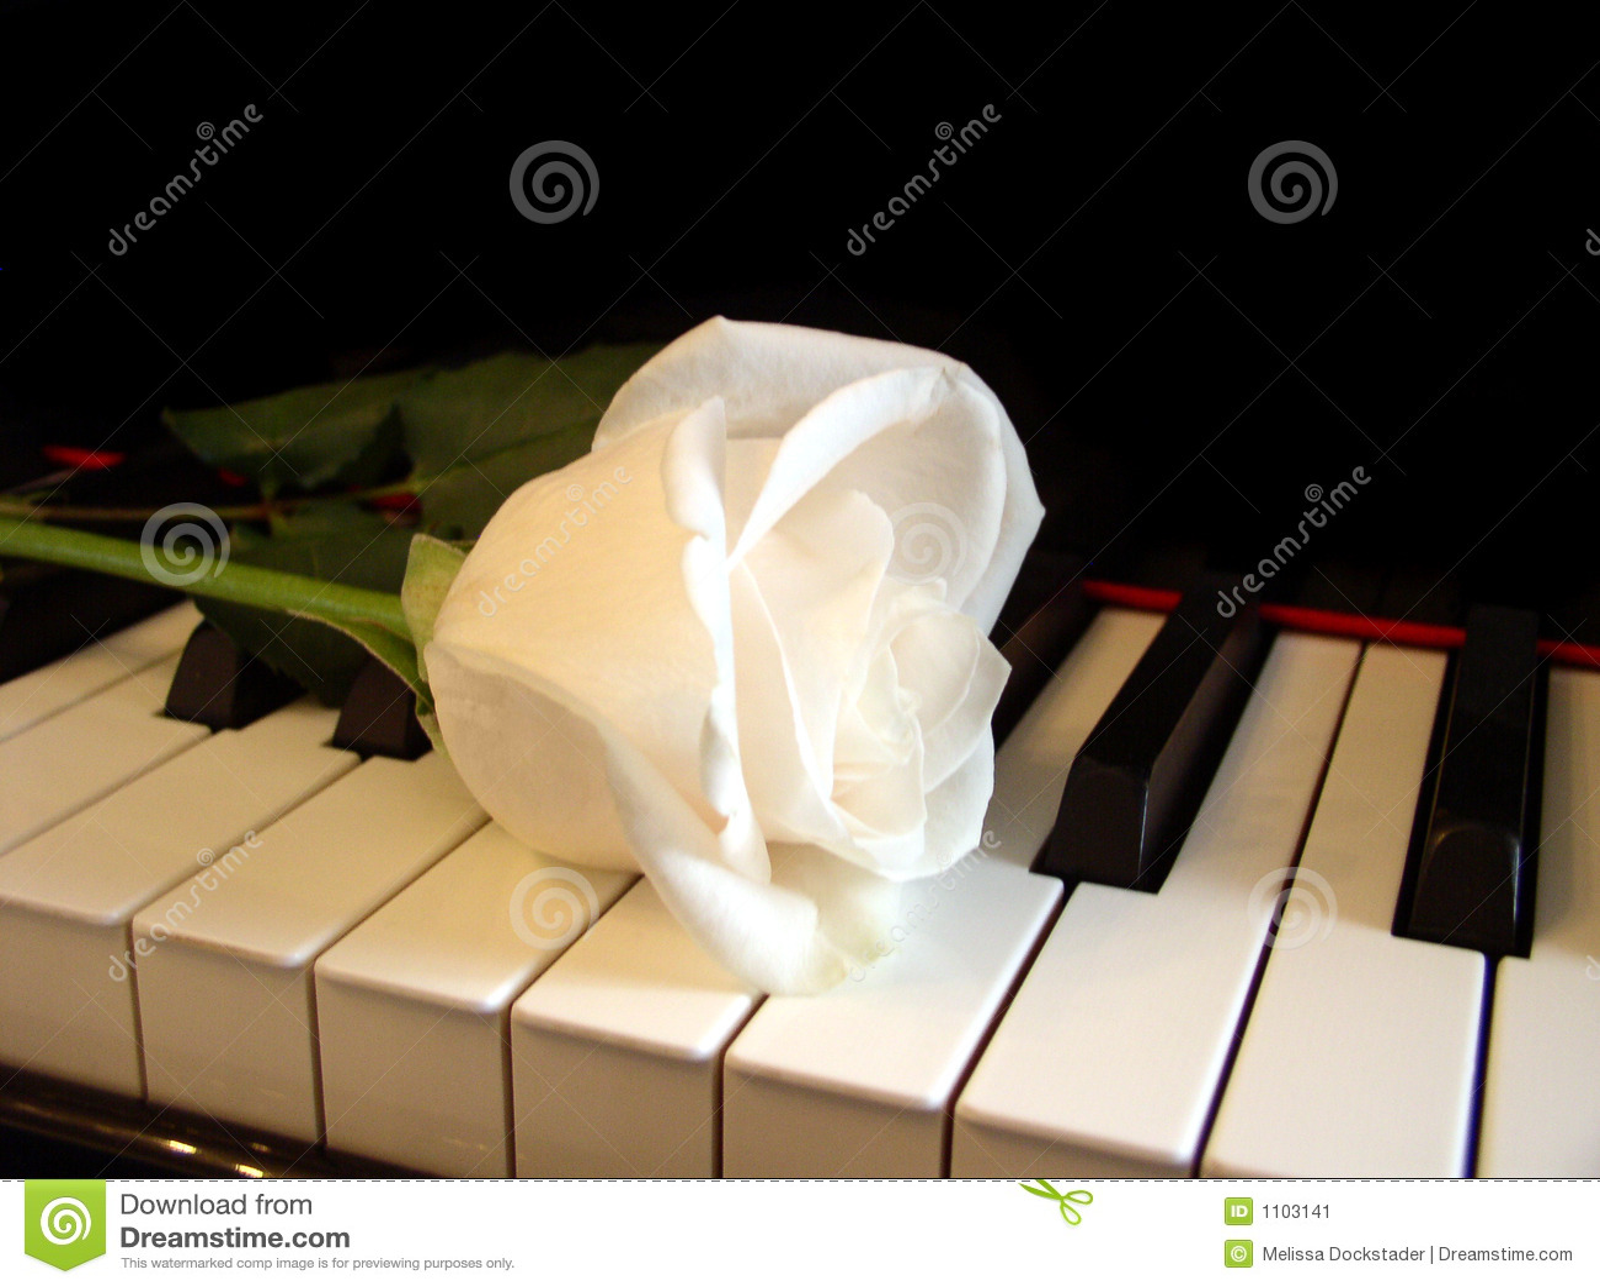 Cream White Rose On Piano Keys Stock Image - Image of ...